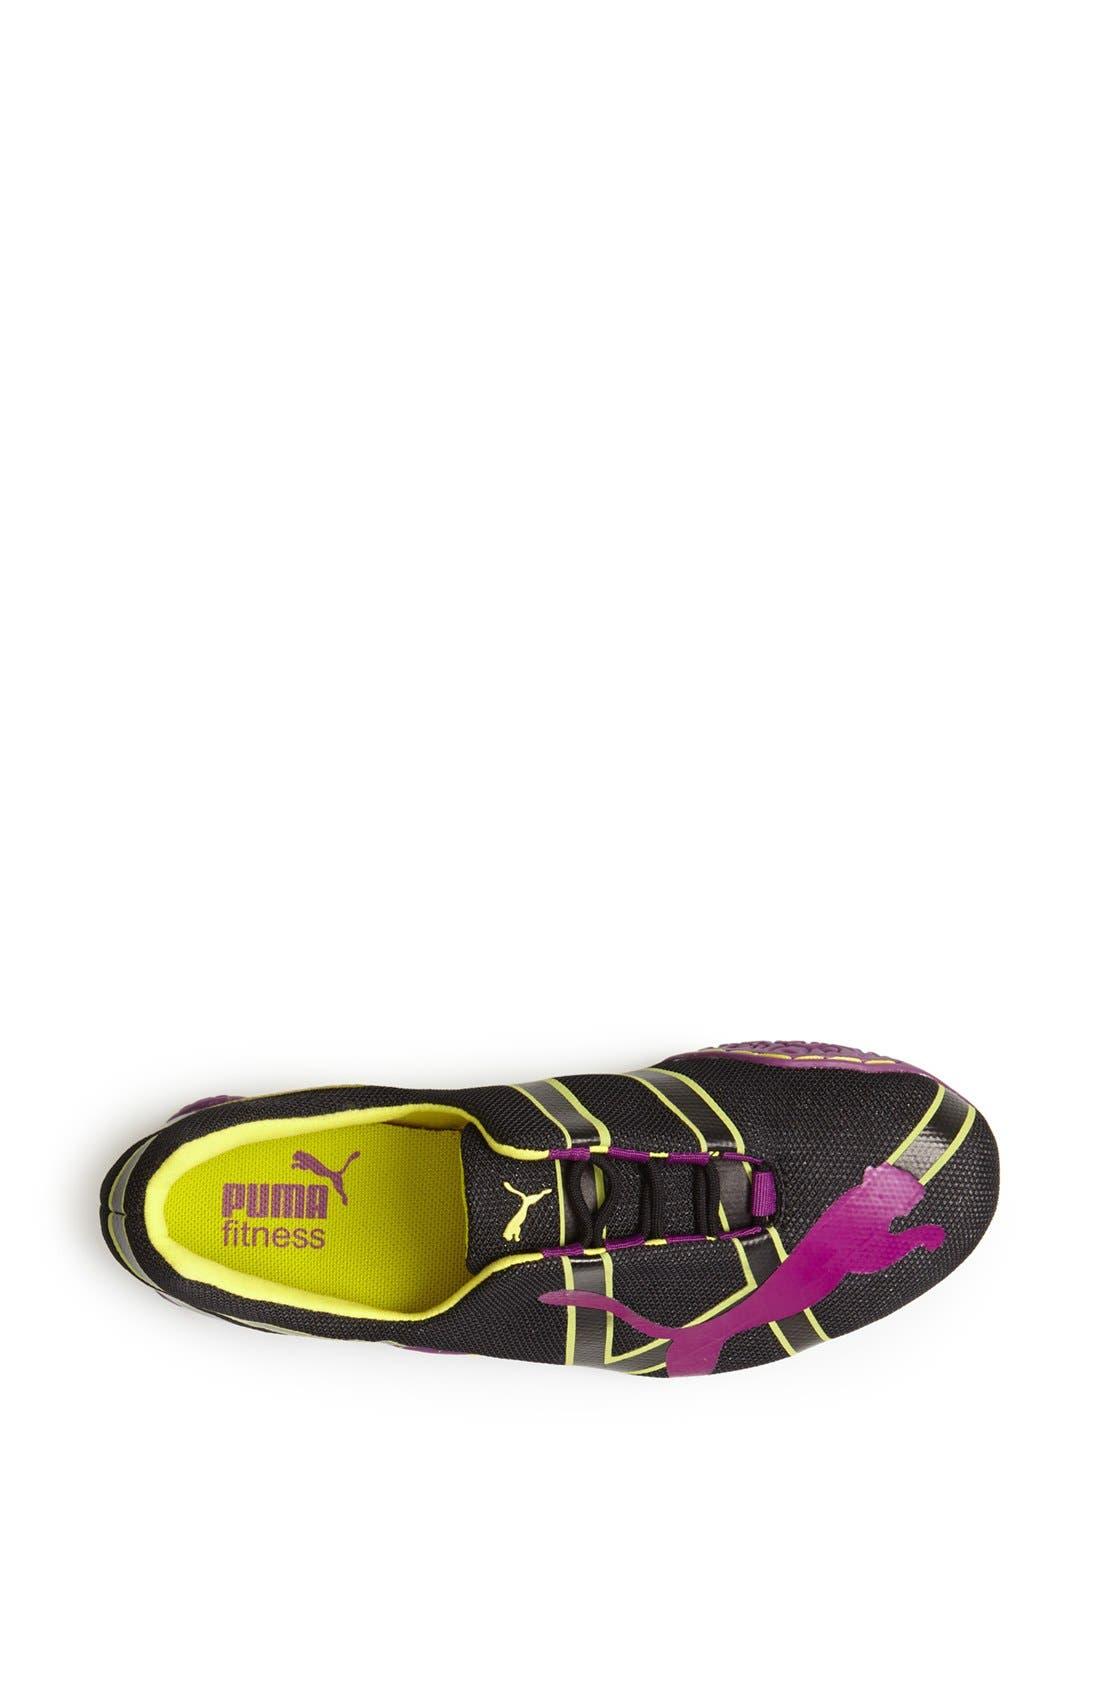 PUMA, 'Anaida' Foldable Sneaker, Alternate thumbnail 2, color, 001